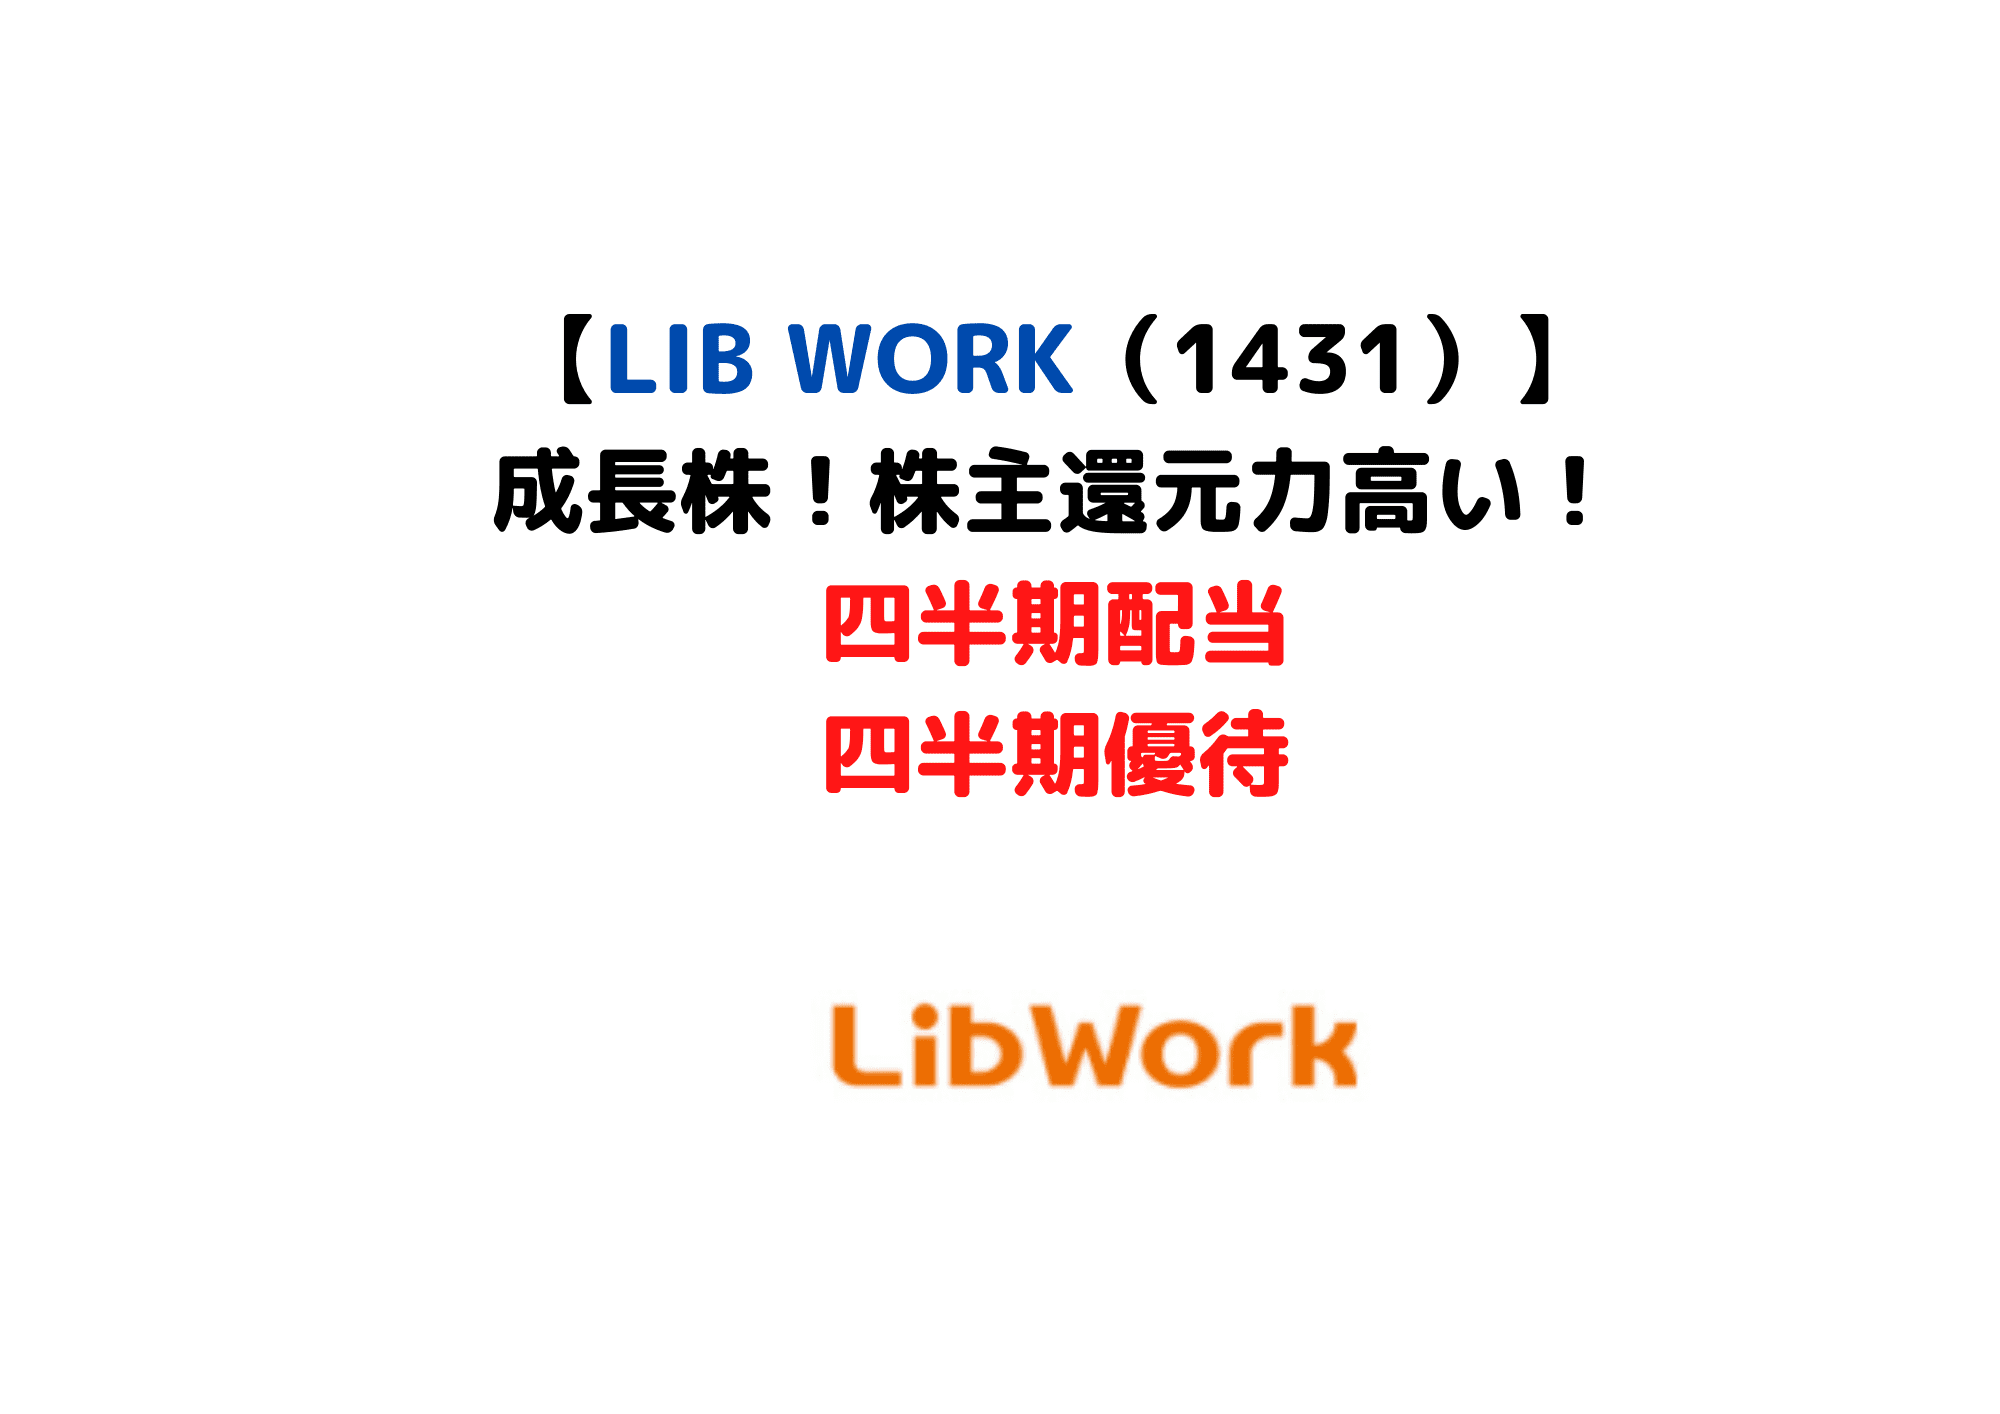 1431 Lib Work